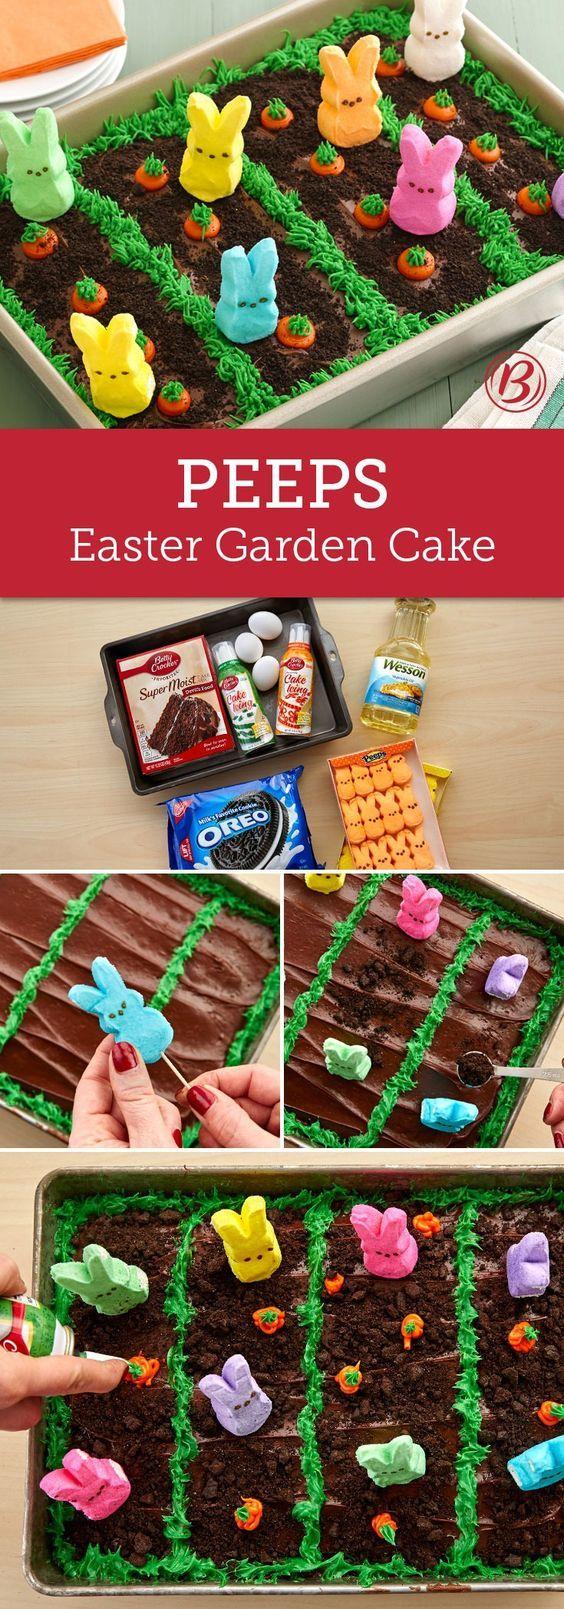 cool Easter Garden Cake